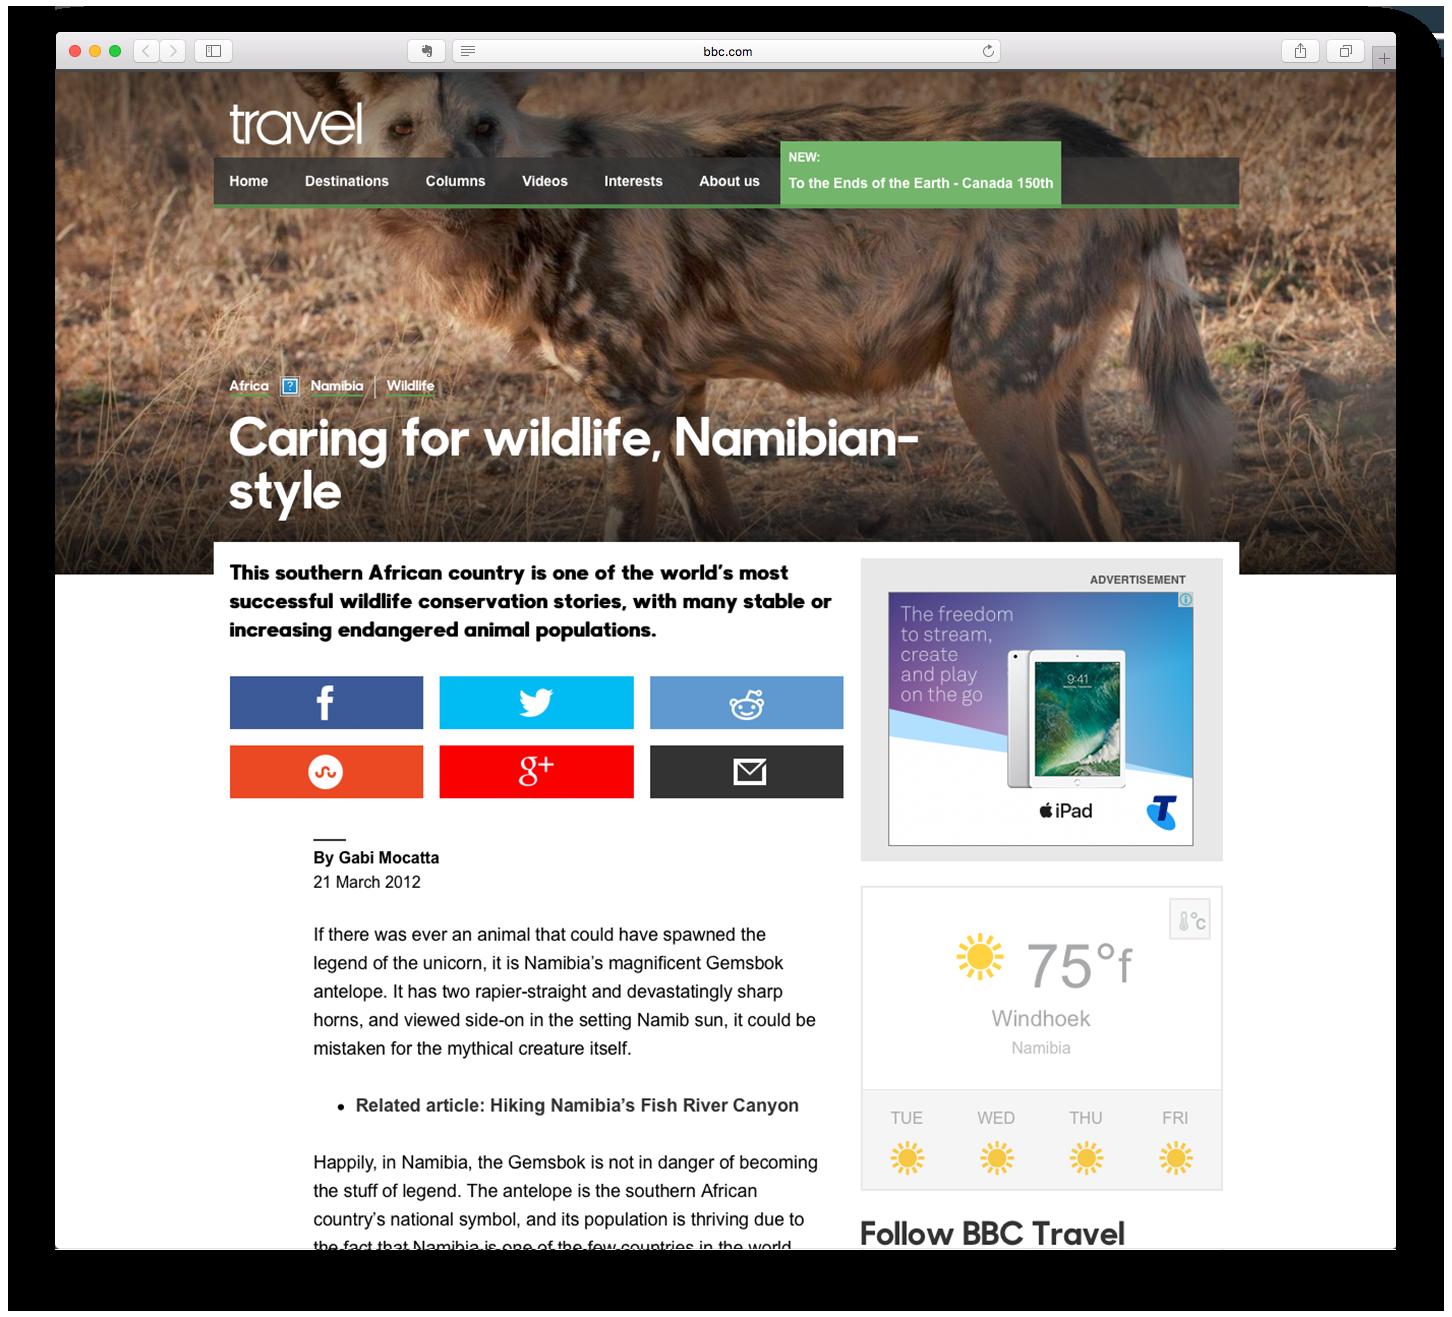 Caring for wildlife, Namibian-style